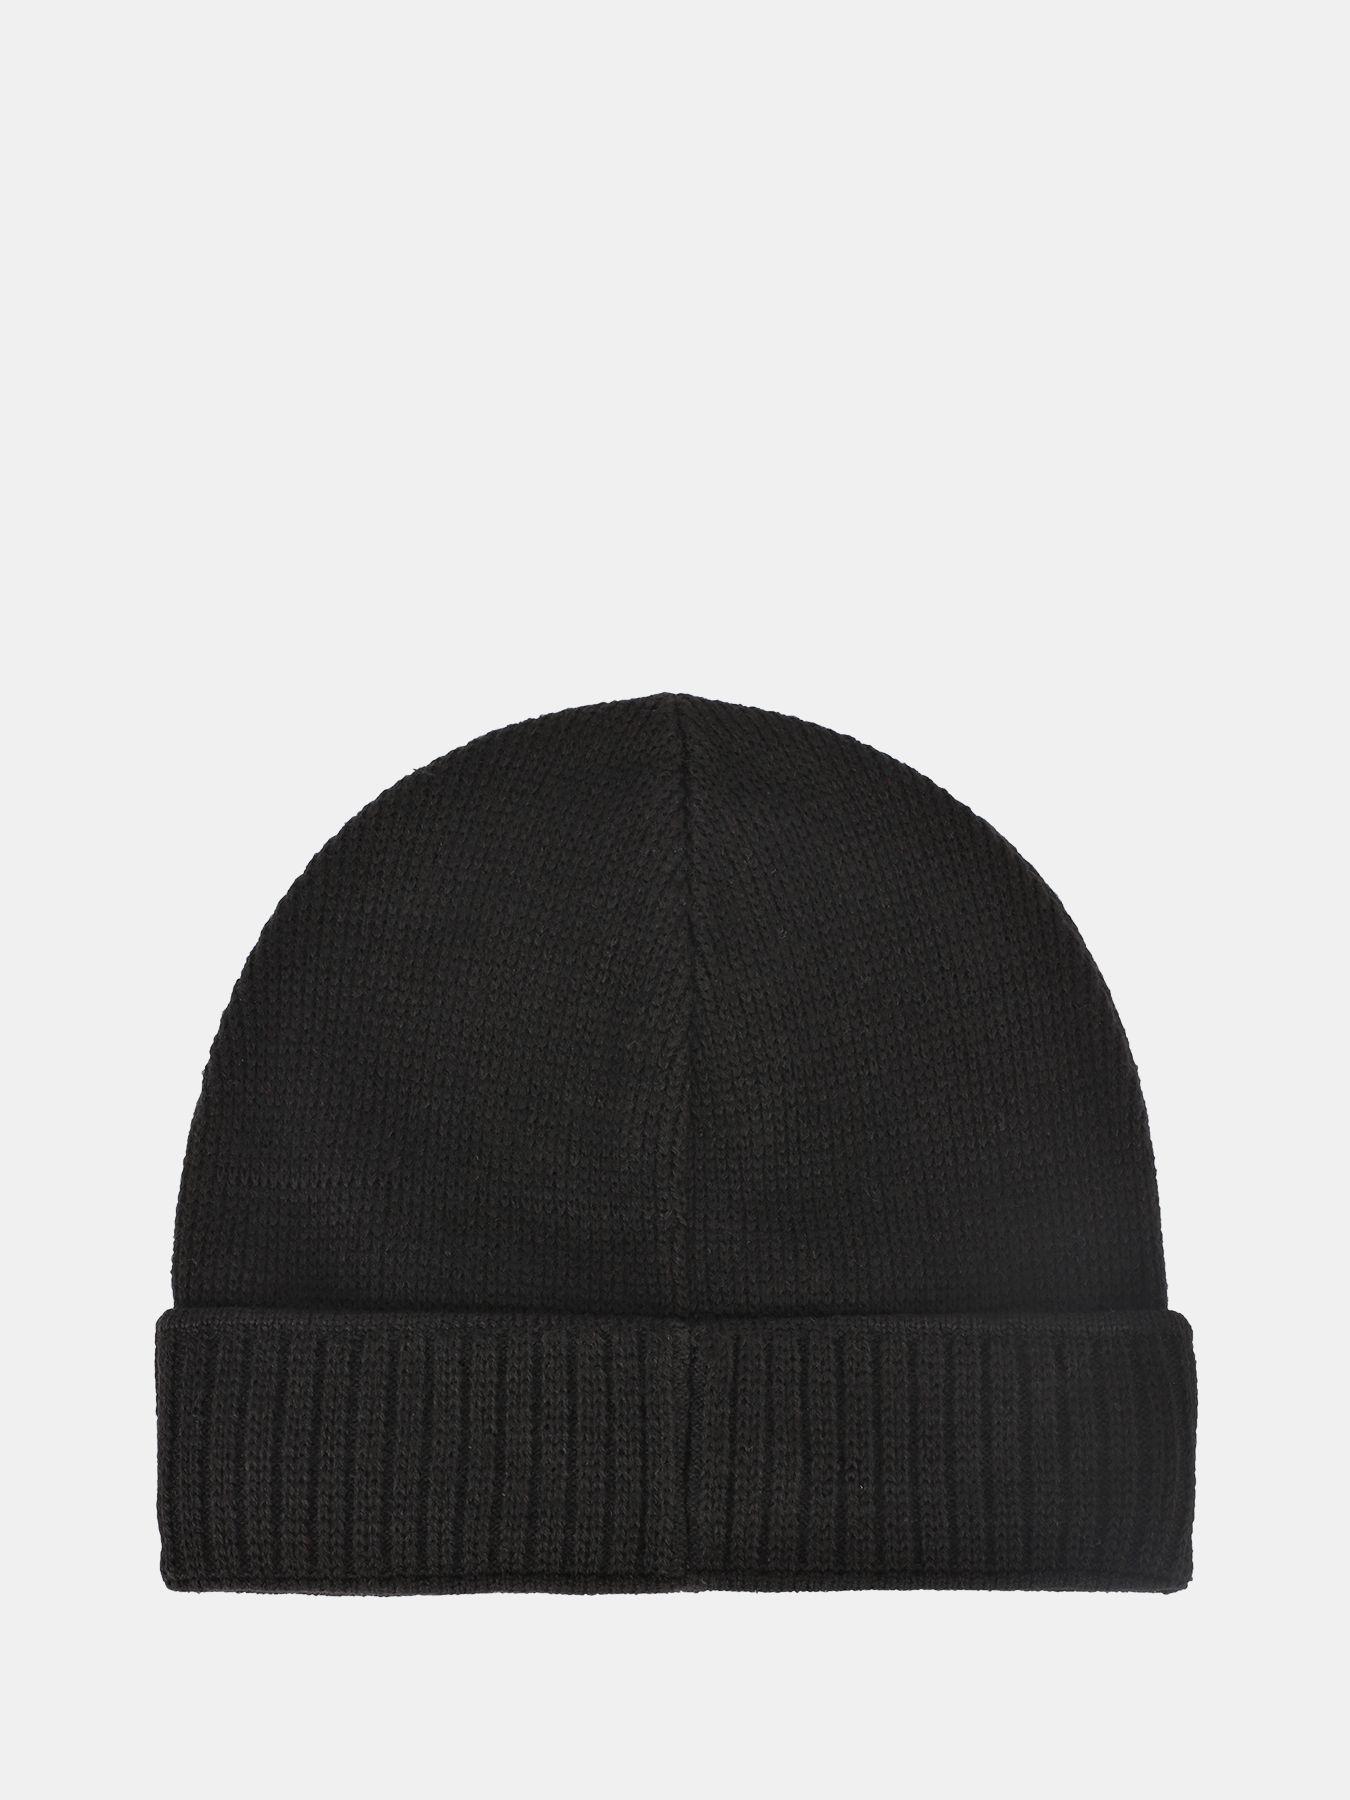 Шапка Ritter Мужская шапка шапка freespirit freespirit mp002xw1agwb